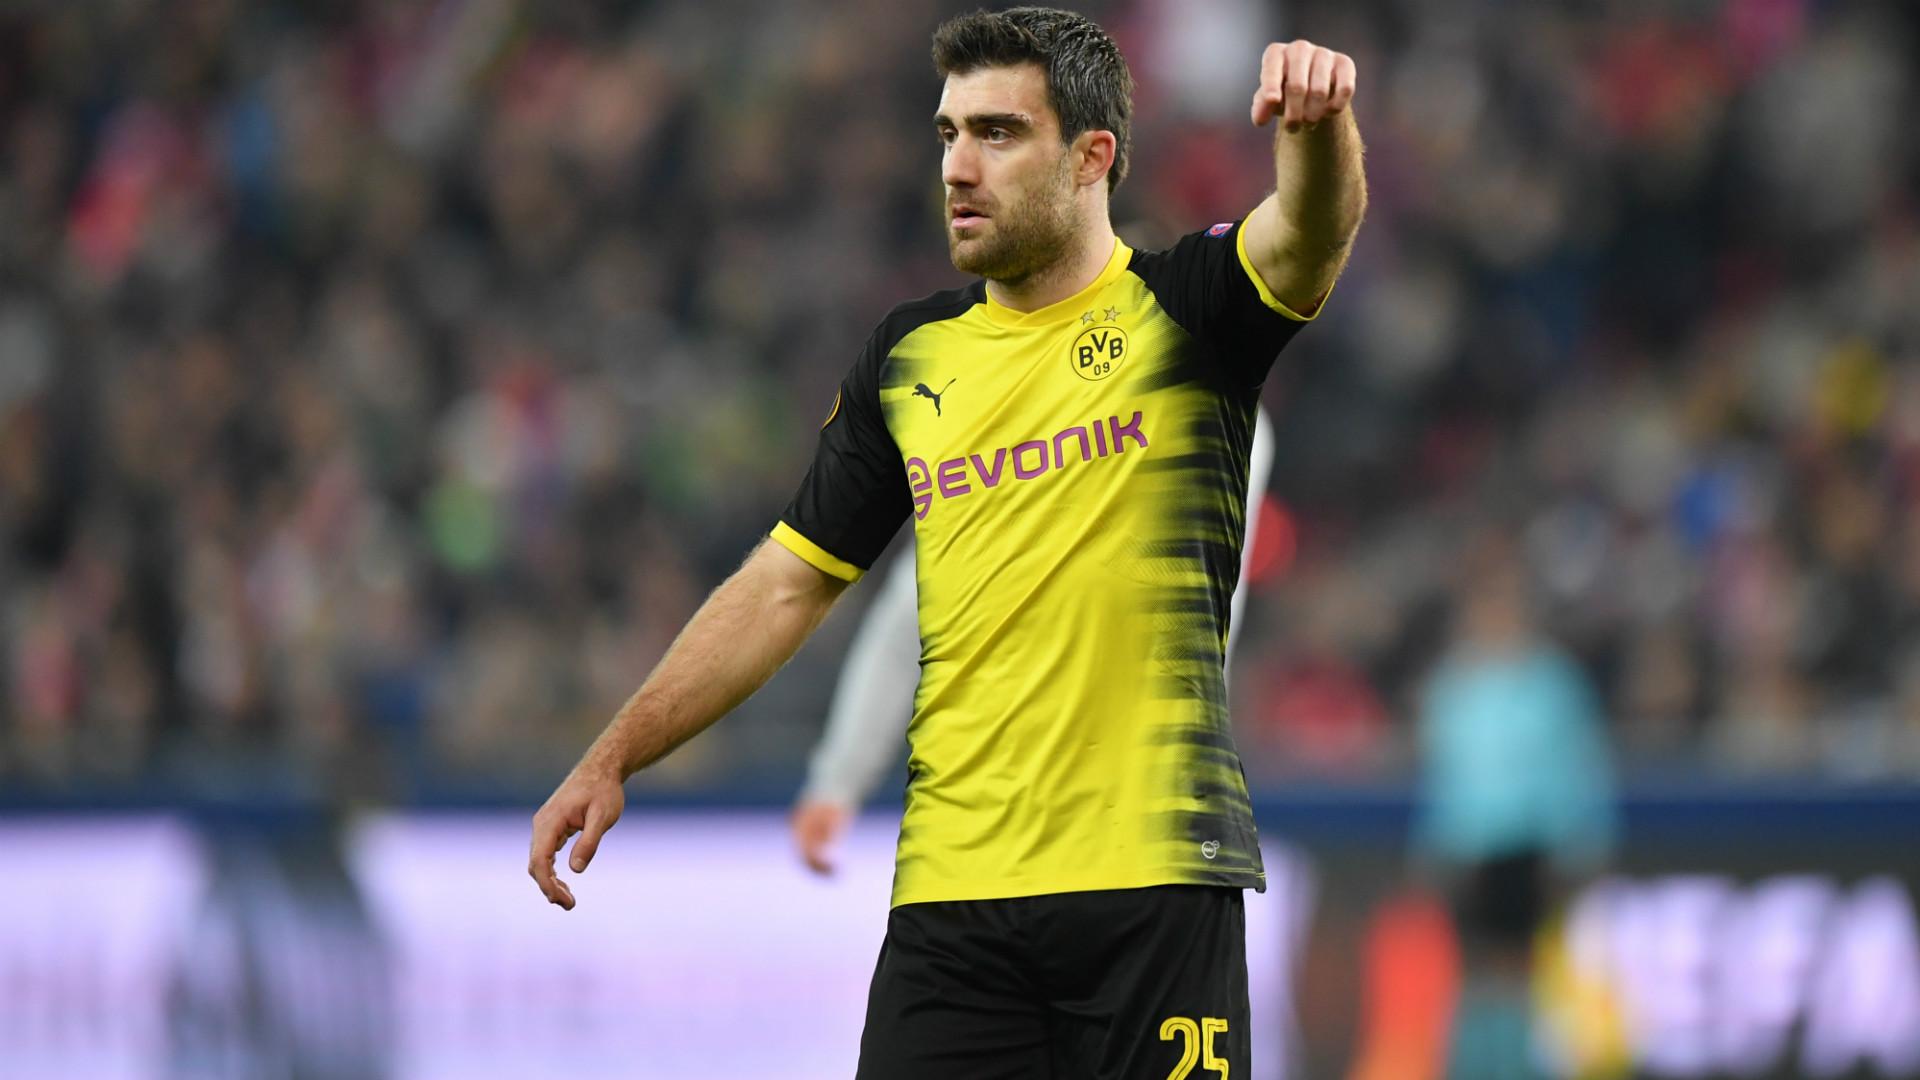 Borussia Dortmund Sokratis